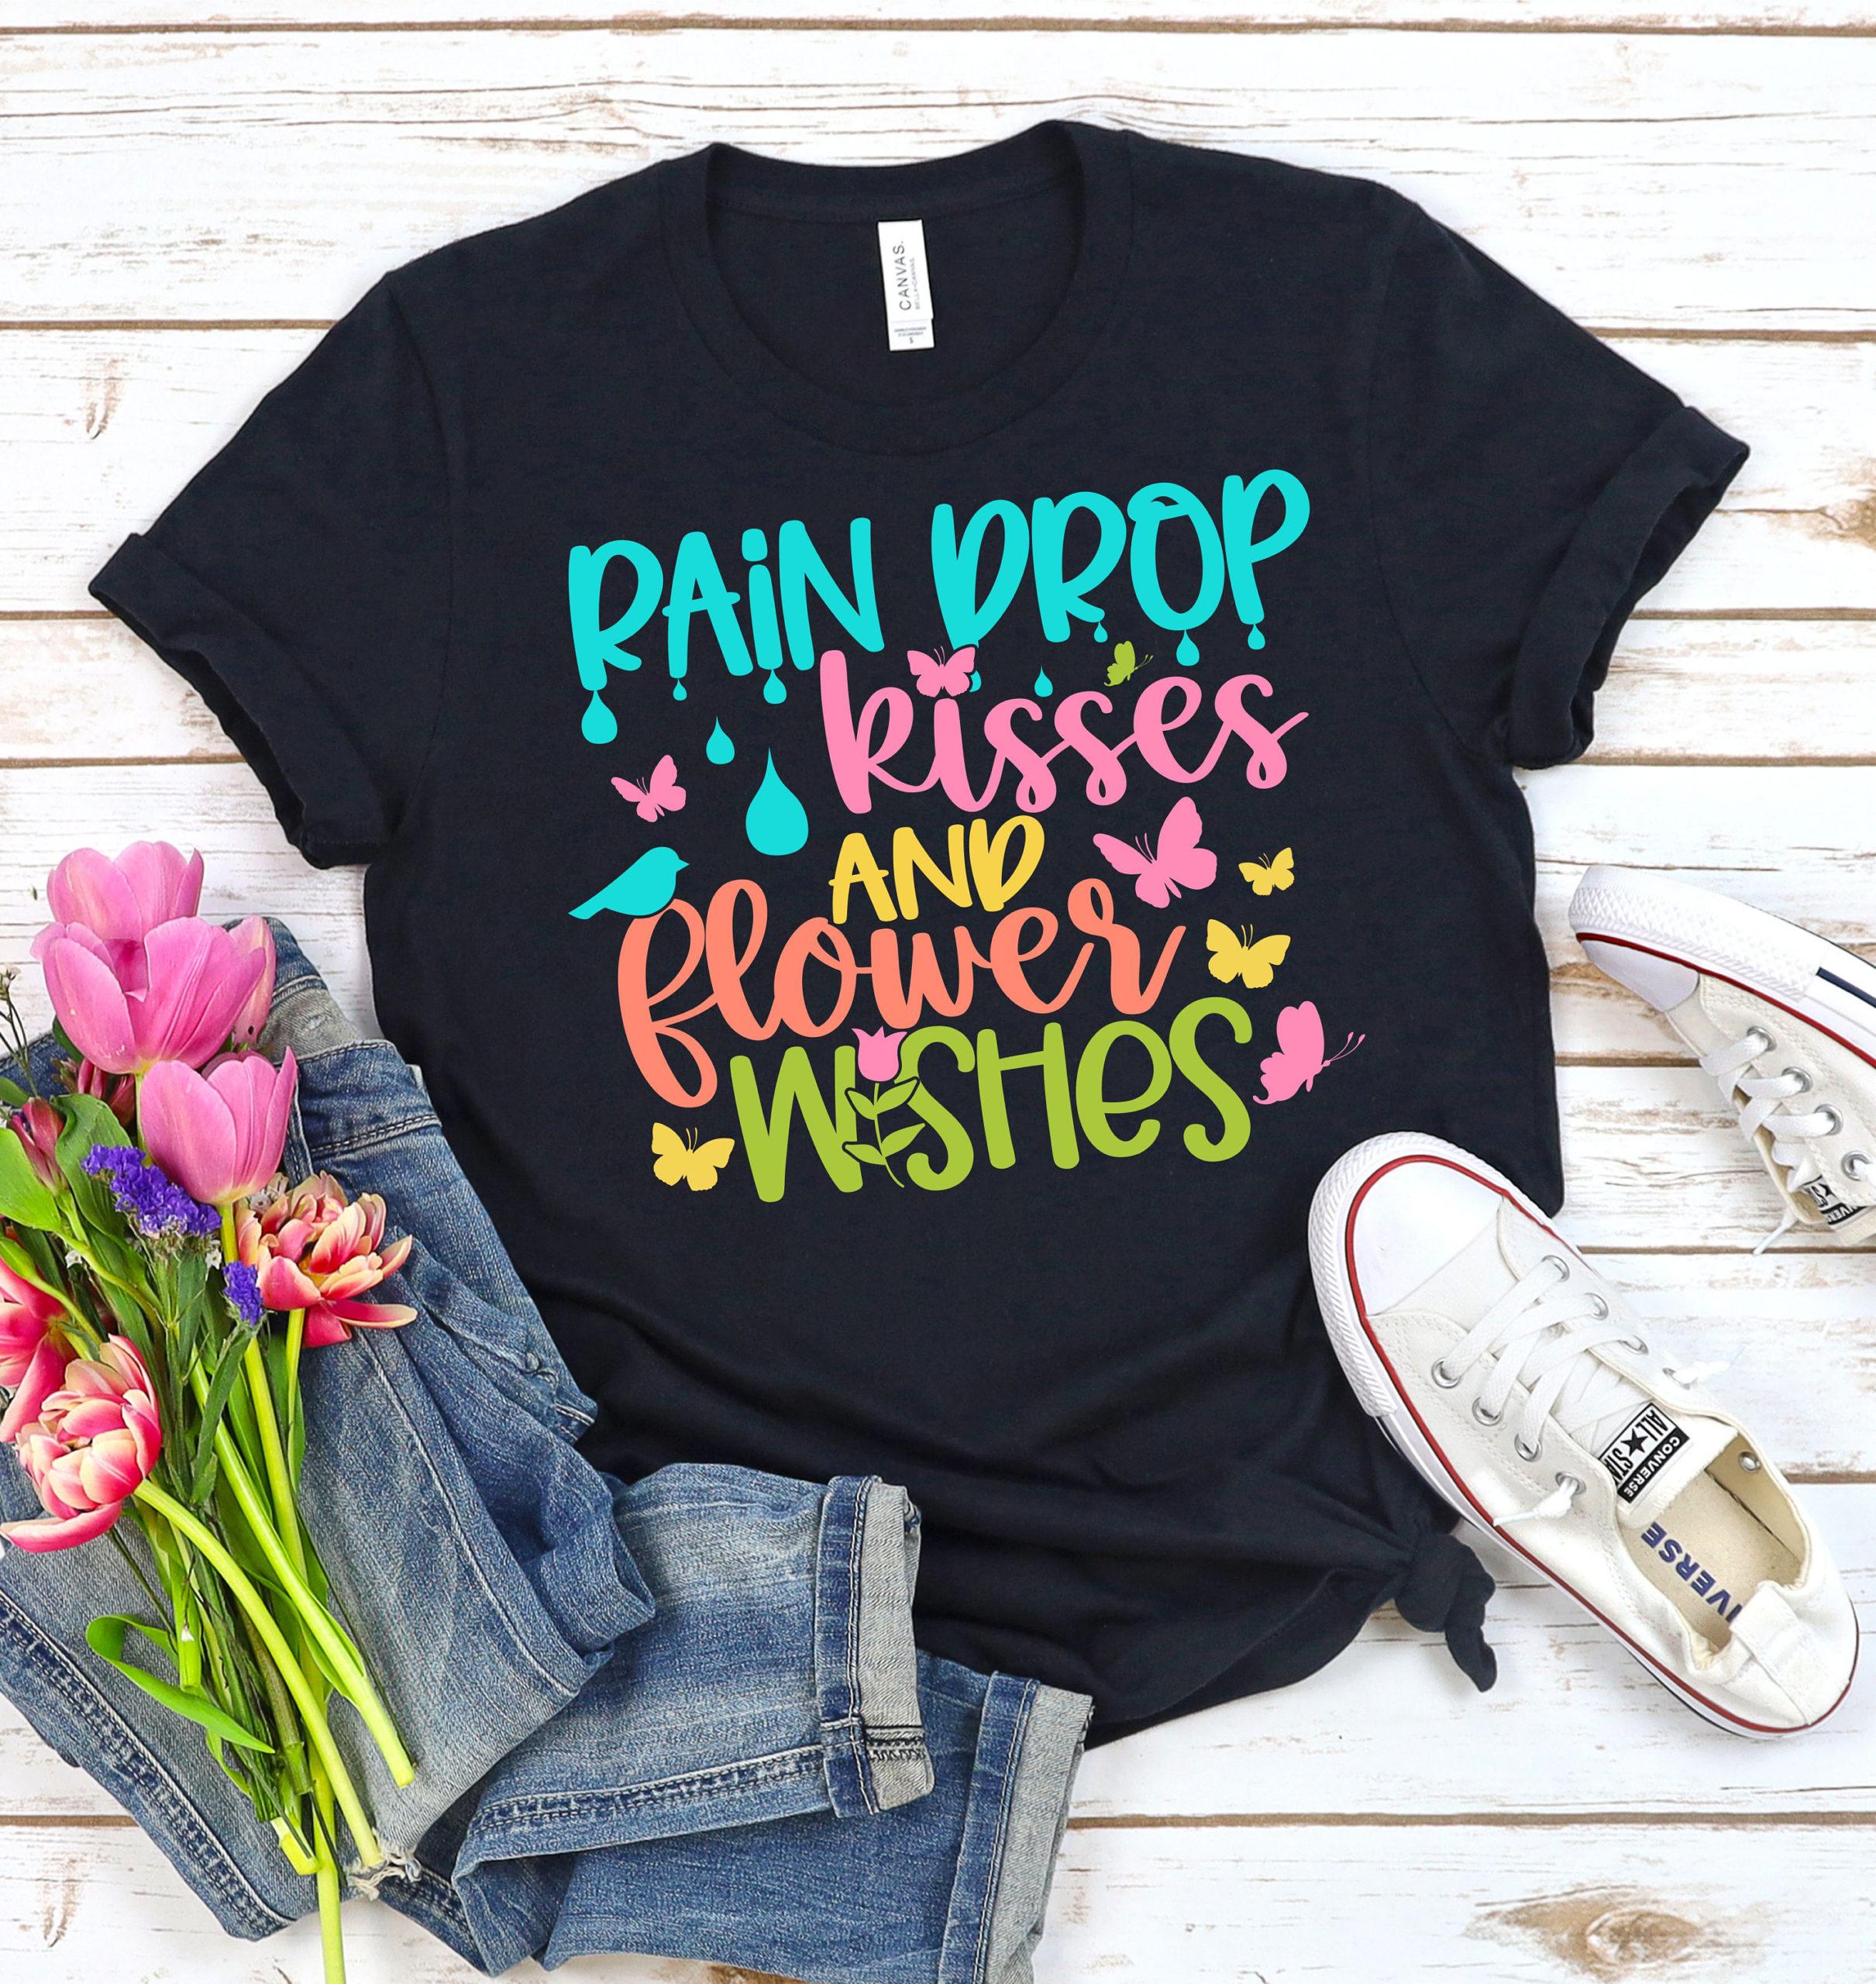 Spring-svg-raindrop-kisses-flower-wishes-svg-rain-svg-flower-bloom-svg-flowers-svg-spring-svg-design-spring-cut-file-spring-cricut-60513a87